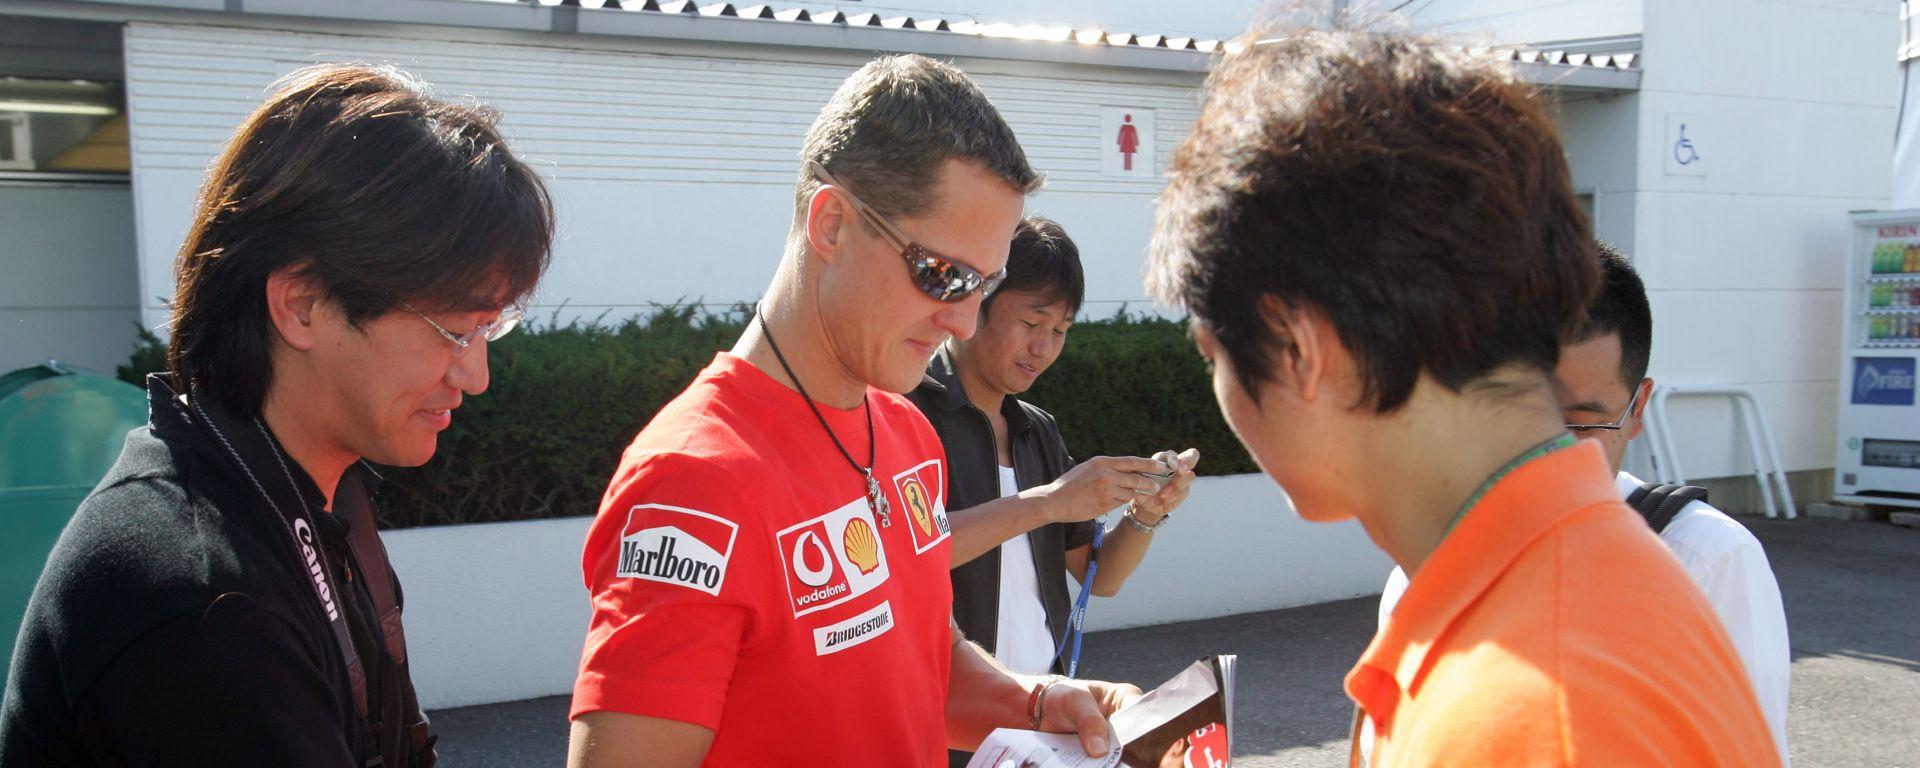 F1, GP Giappone 2005: Michael Schumacher firma autografi ai tifosi